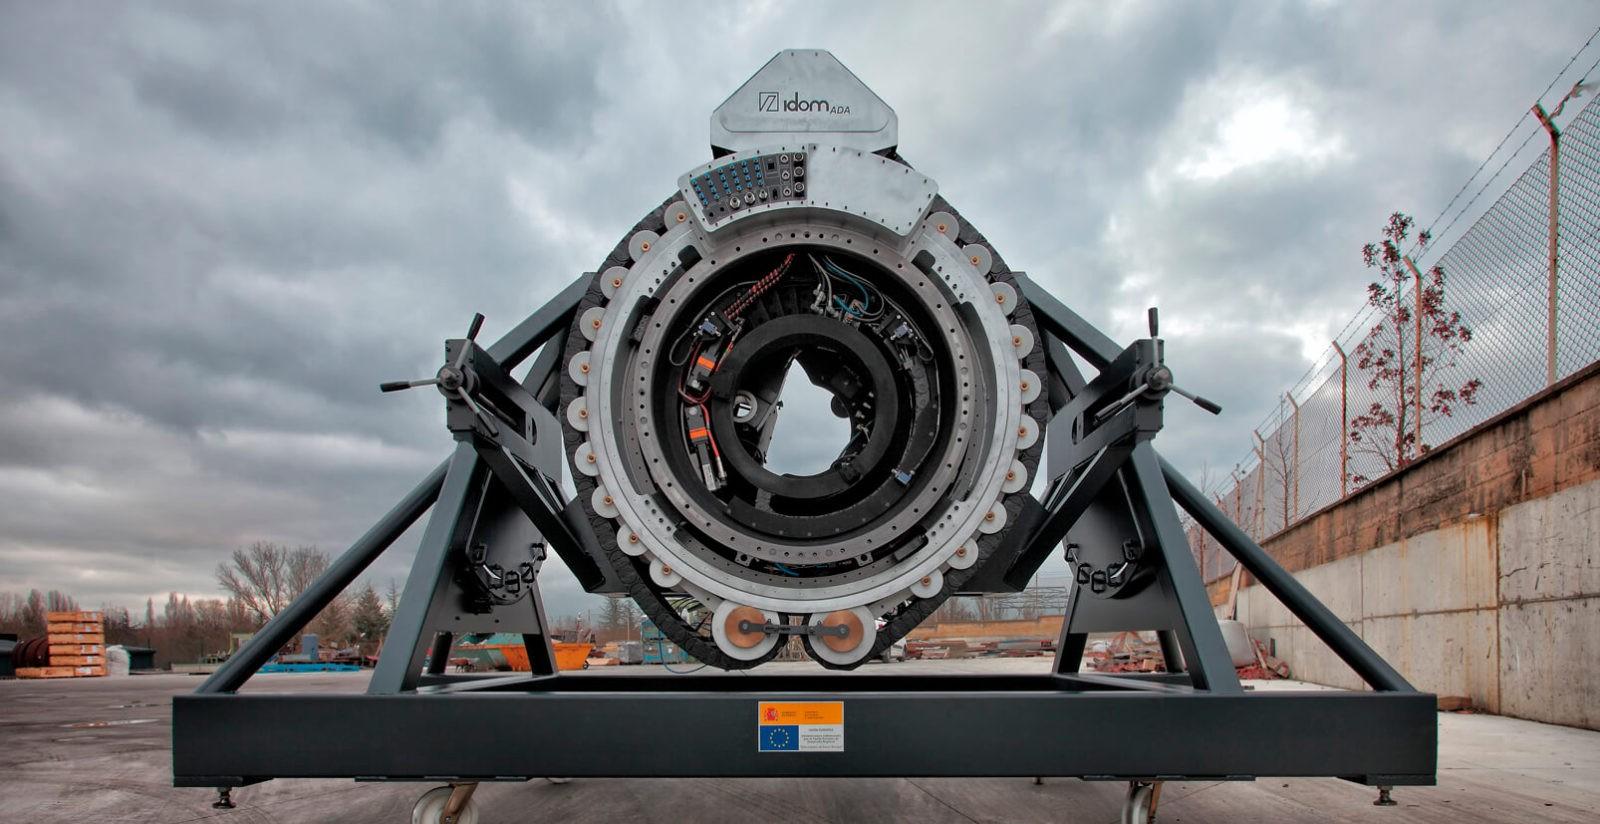 Telescope_Field_Rotator_Gran_Telescopio_Canarias_Idom_ADA_4_